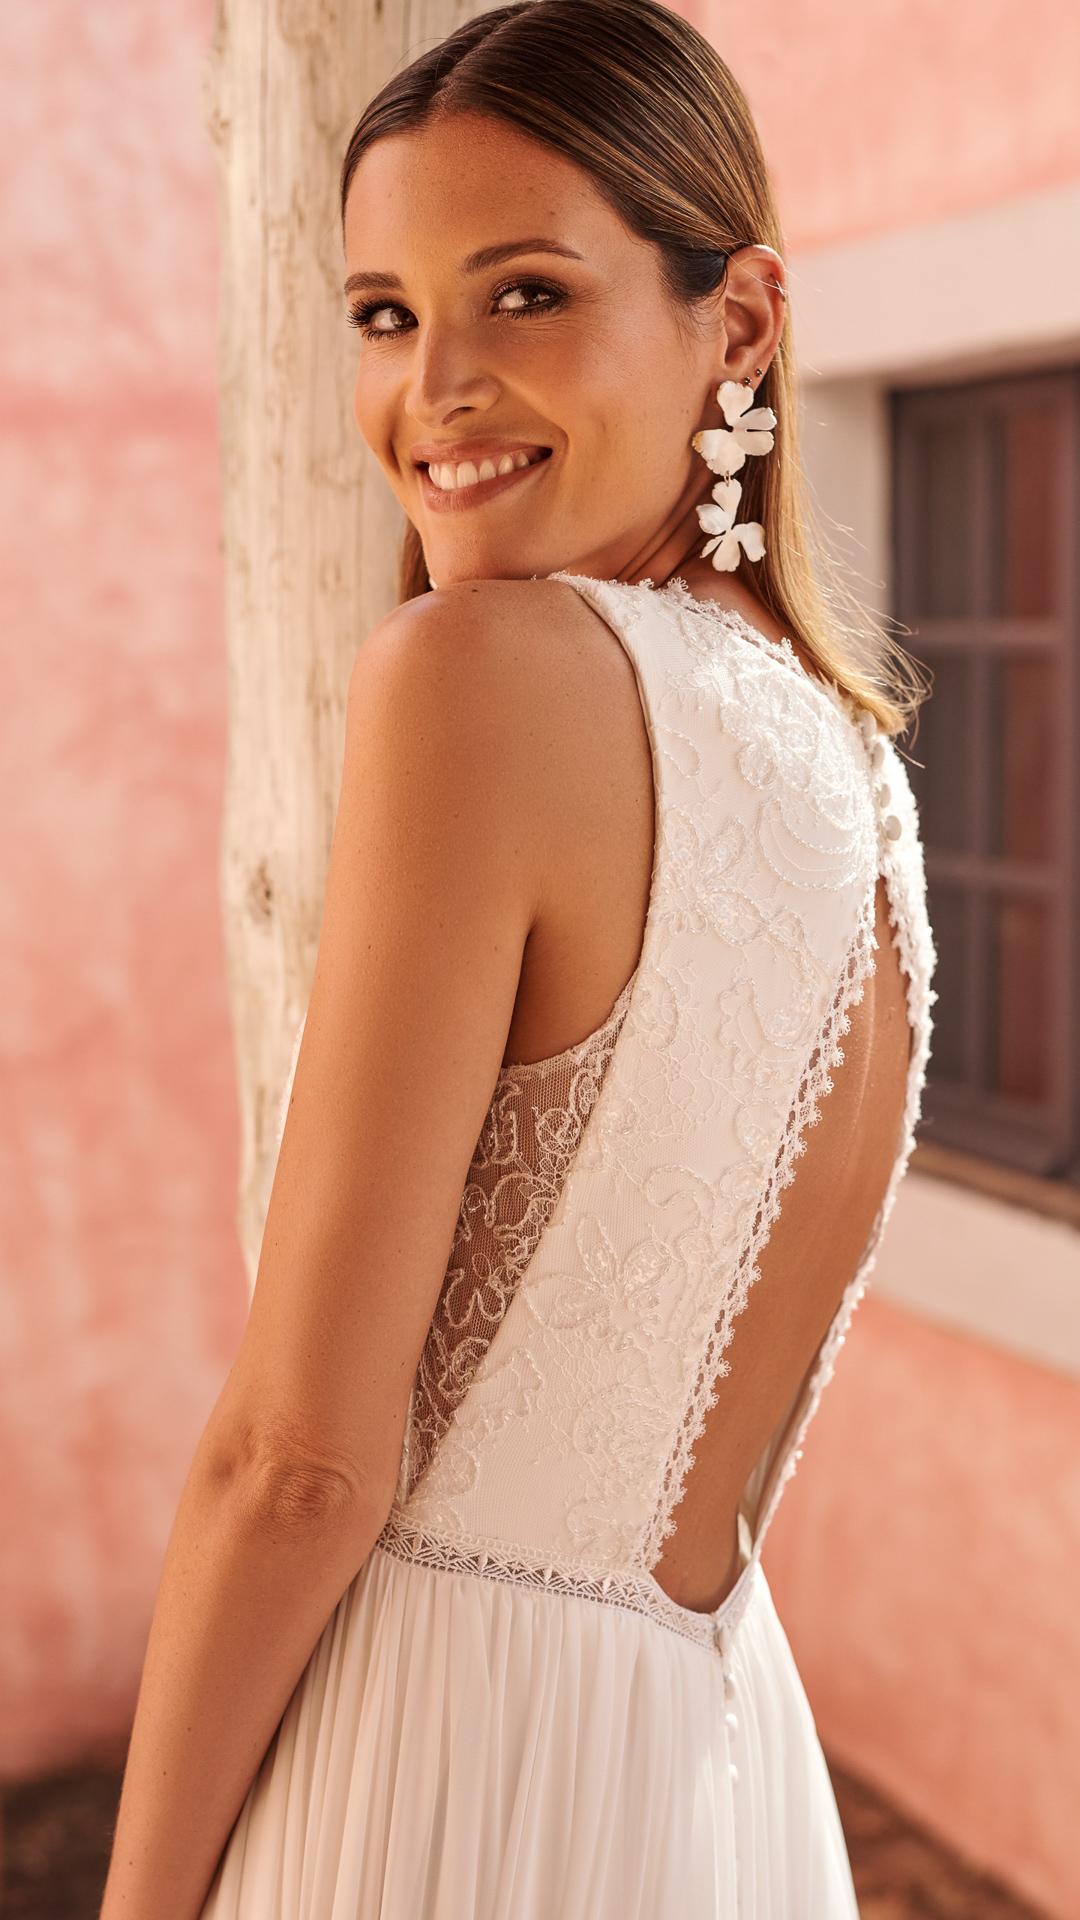 She sparkles - Marylise Brautkleider 2020